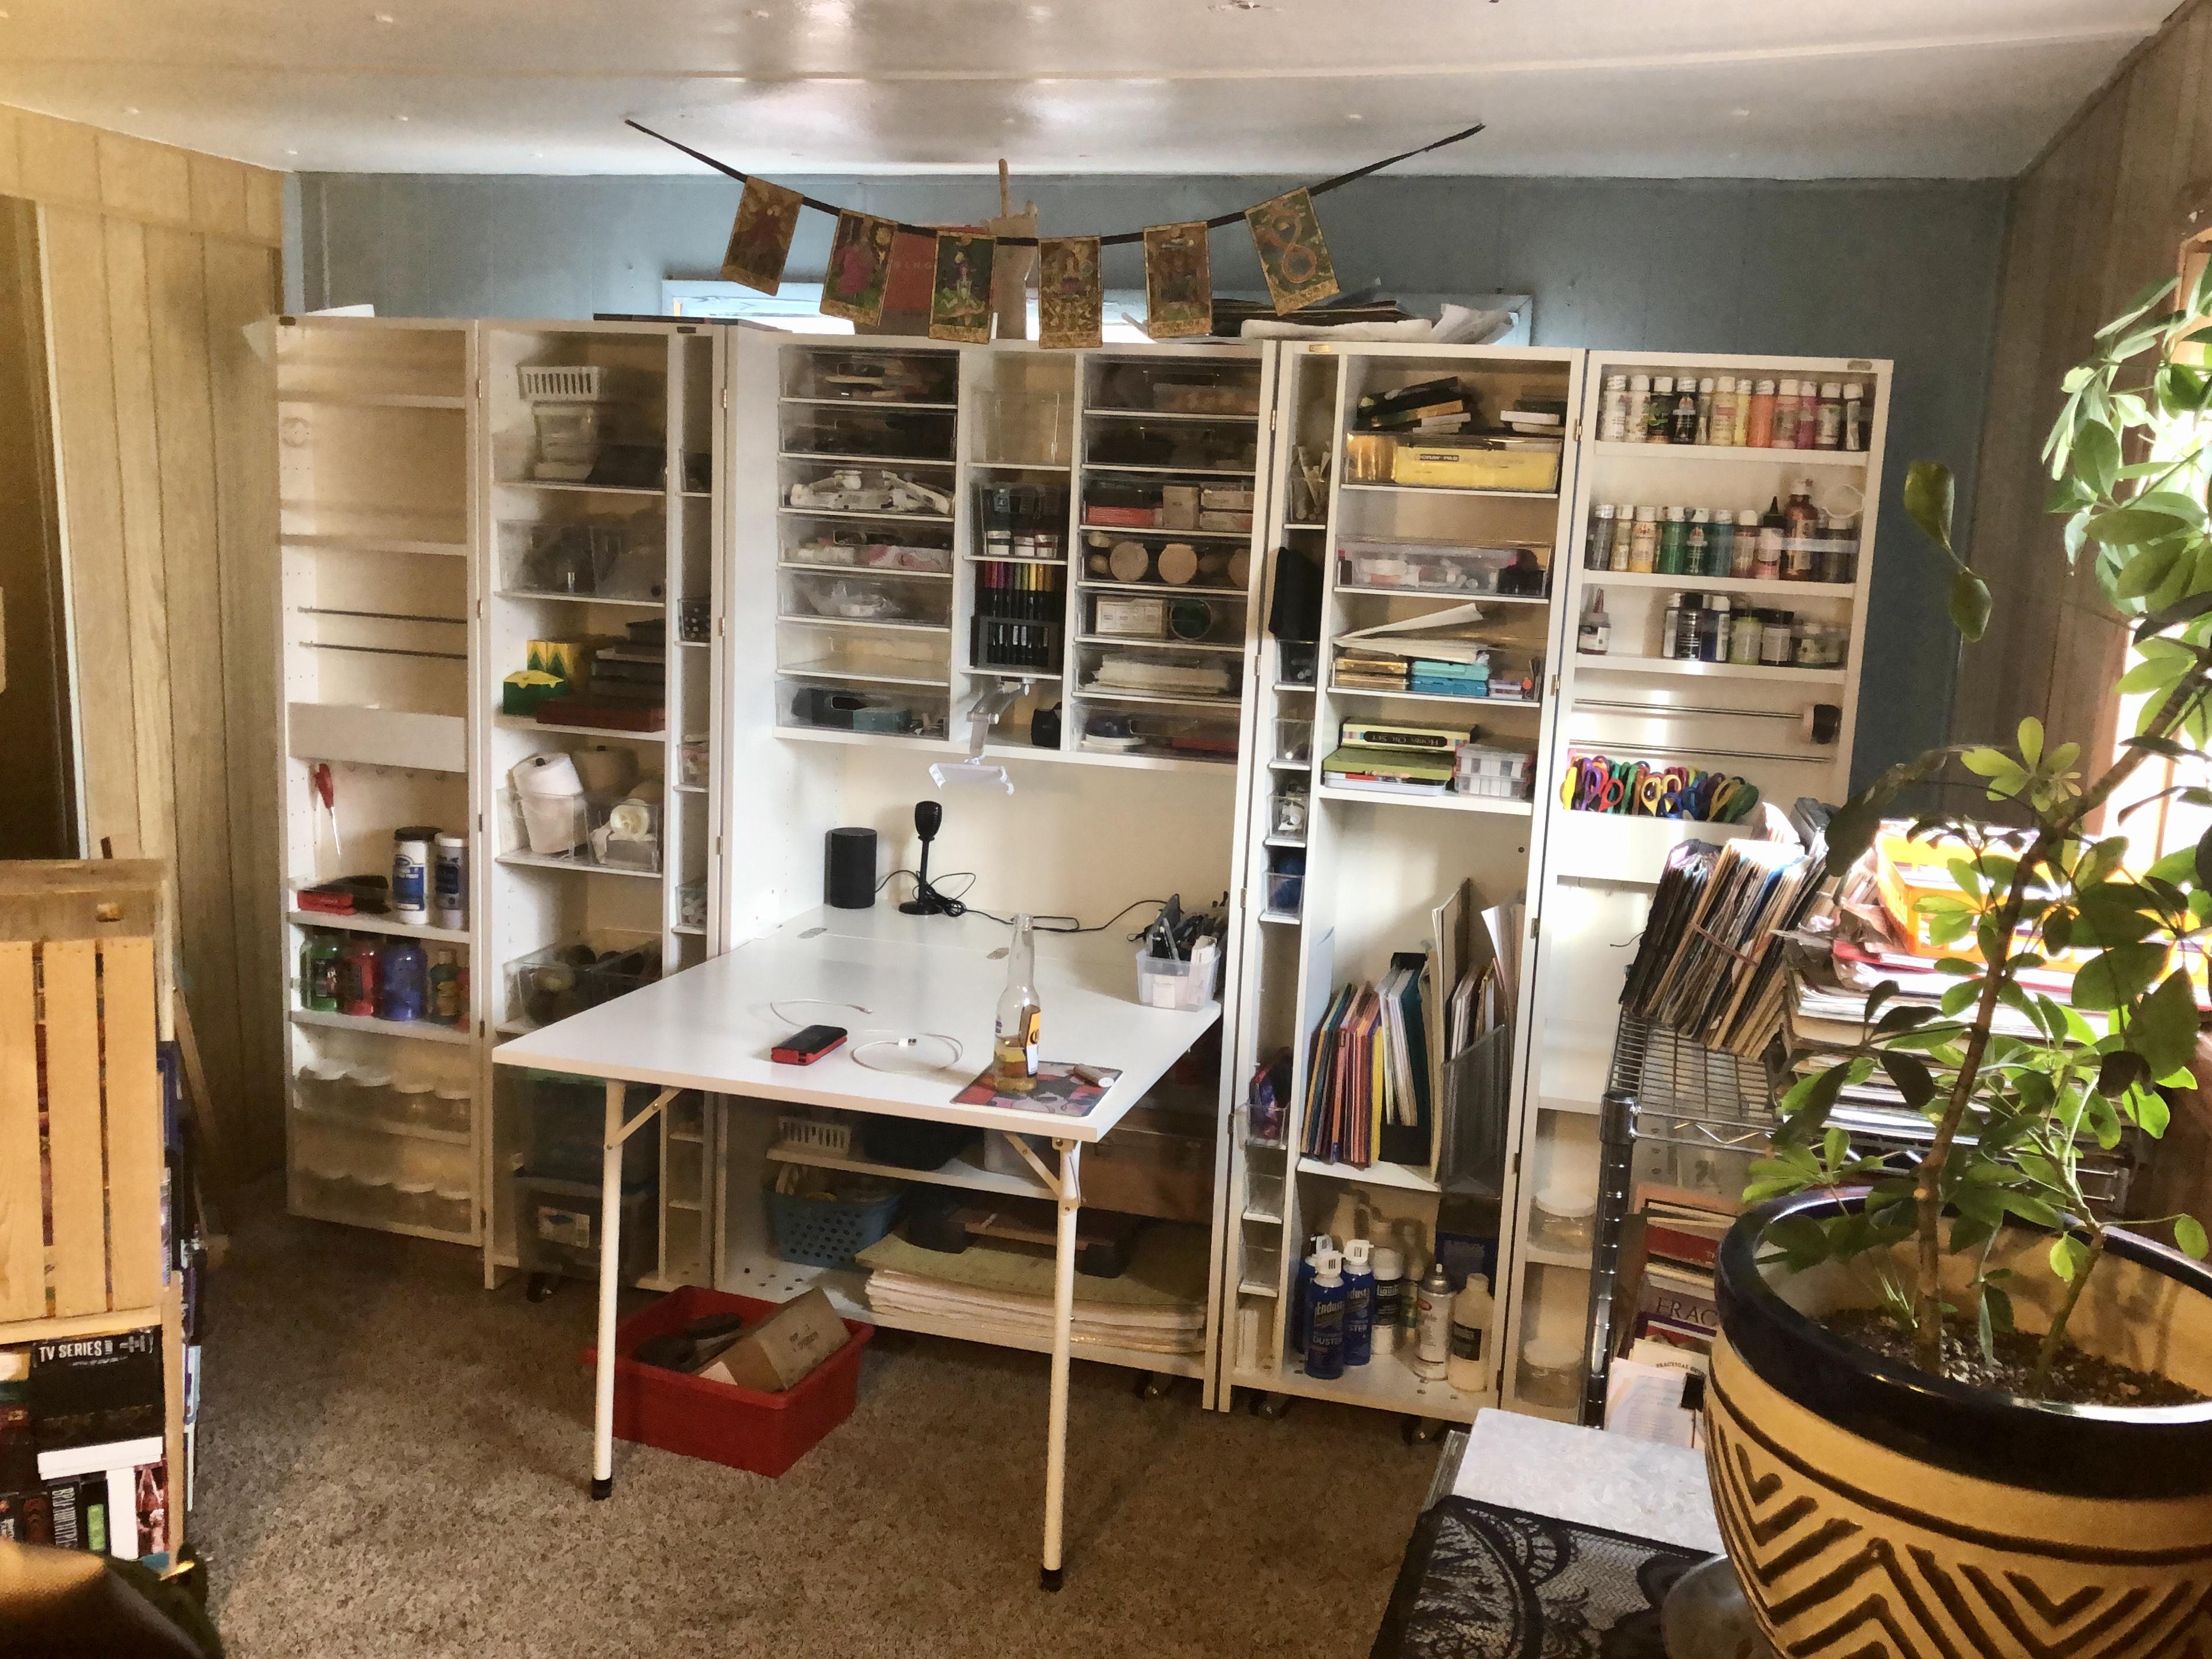 My Art Room Renovation!